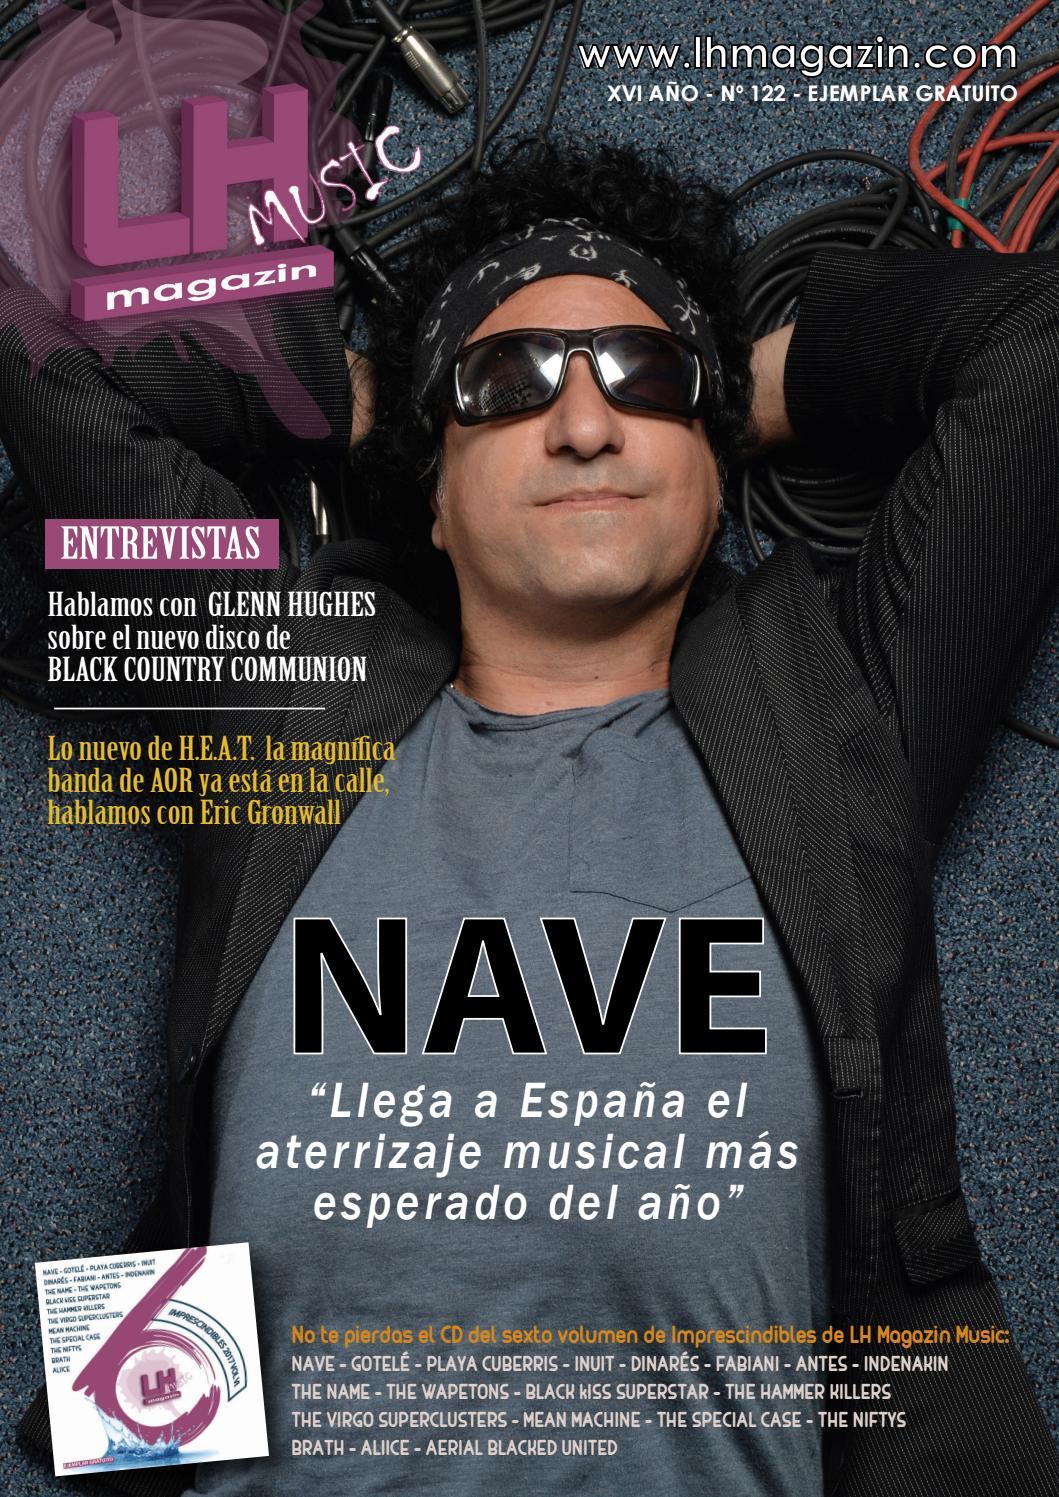 25b2538820 LH Magazin Music - Nave